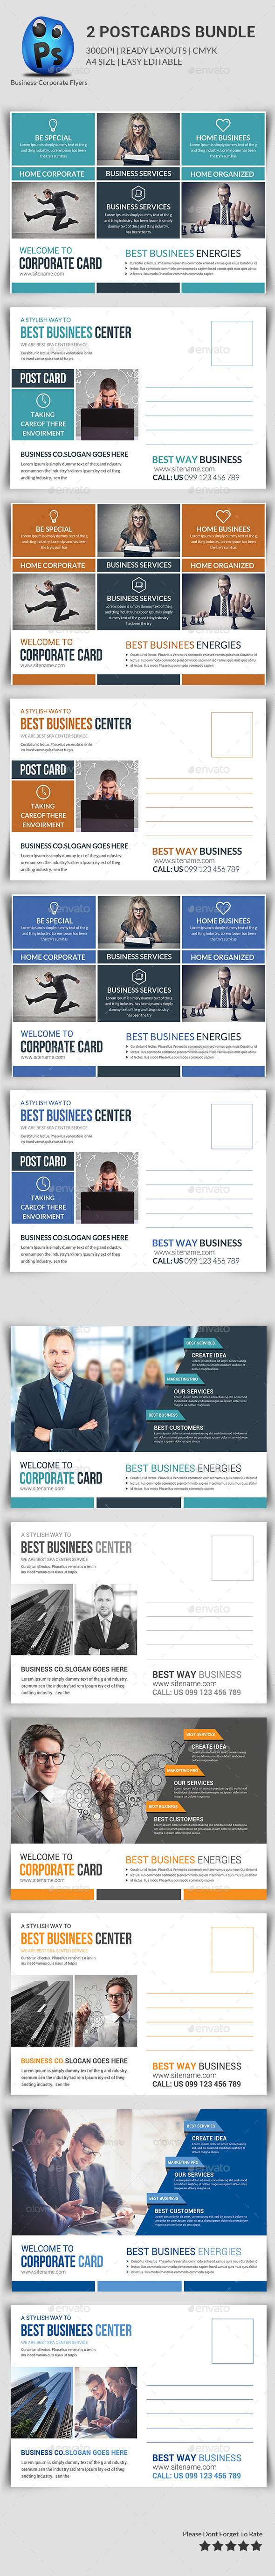 GraphicRiver Multipurpose Business Postcard Bundle 11284800